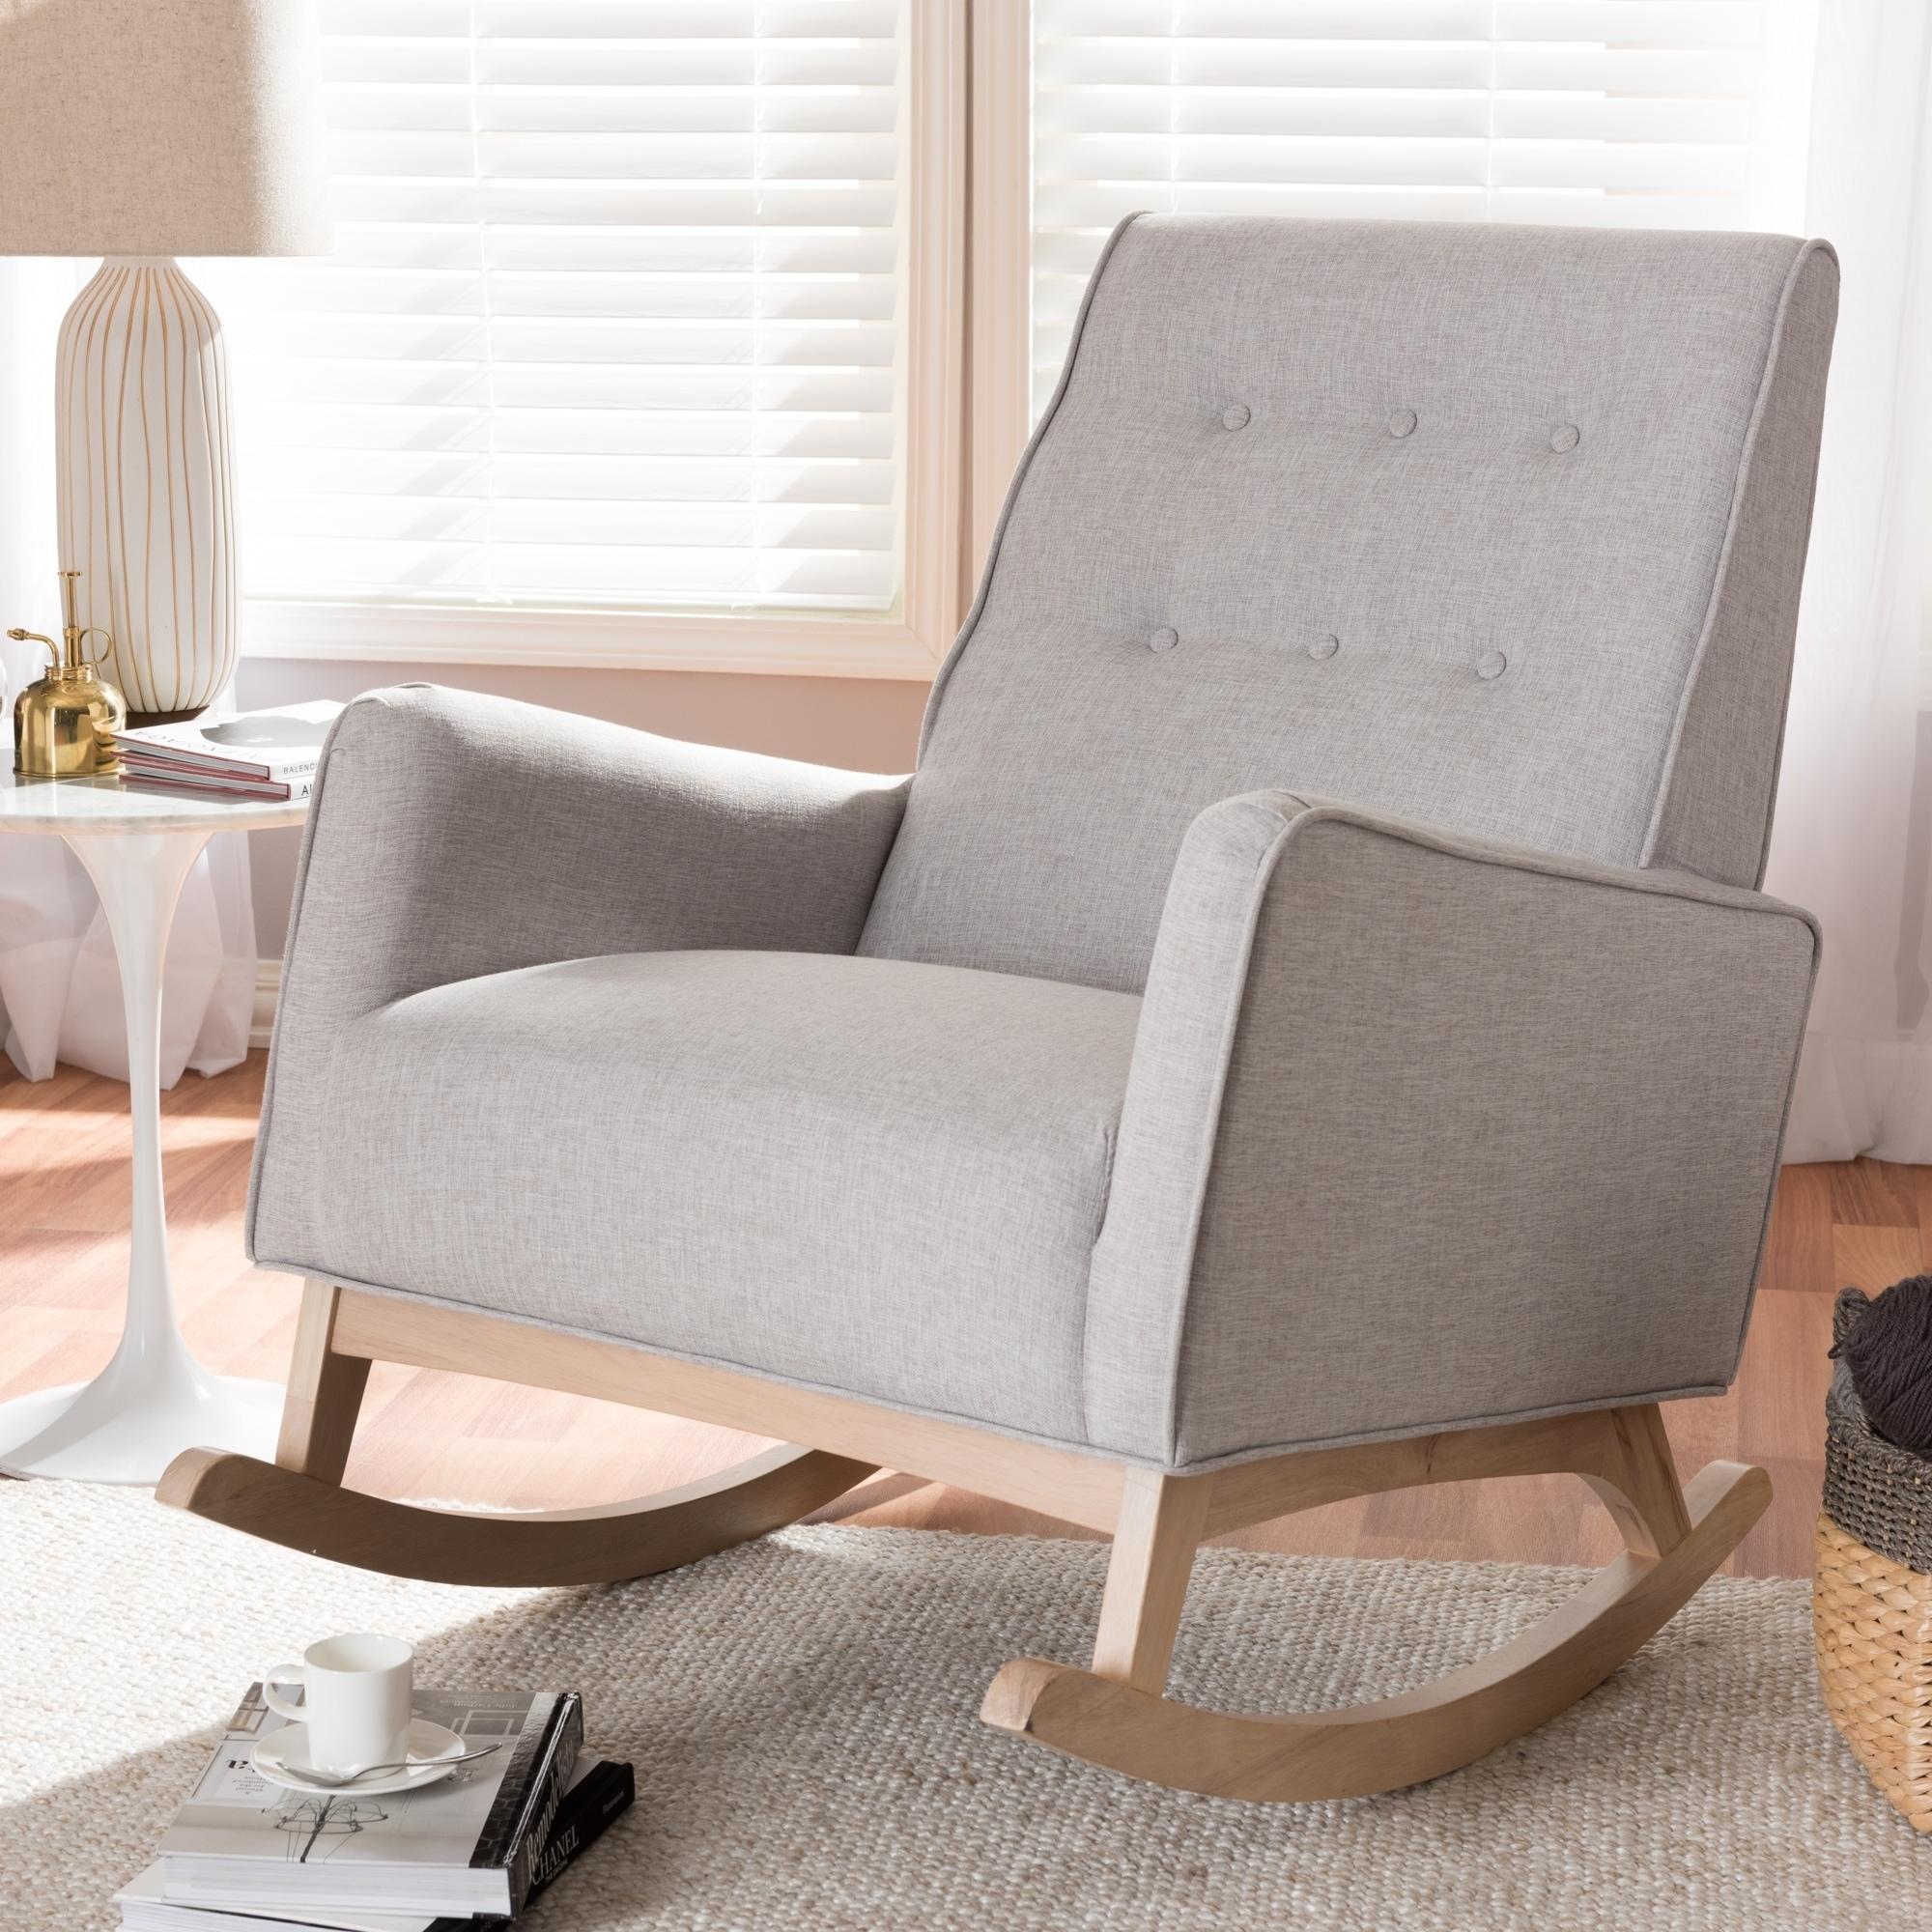 Shop Mid-century Fabric Rocking Chair by Baxton Studio - Free ...